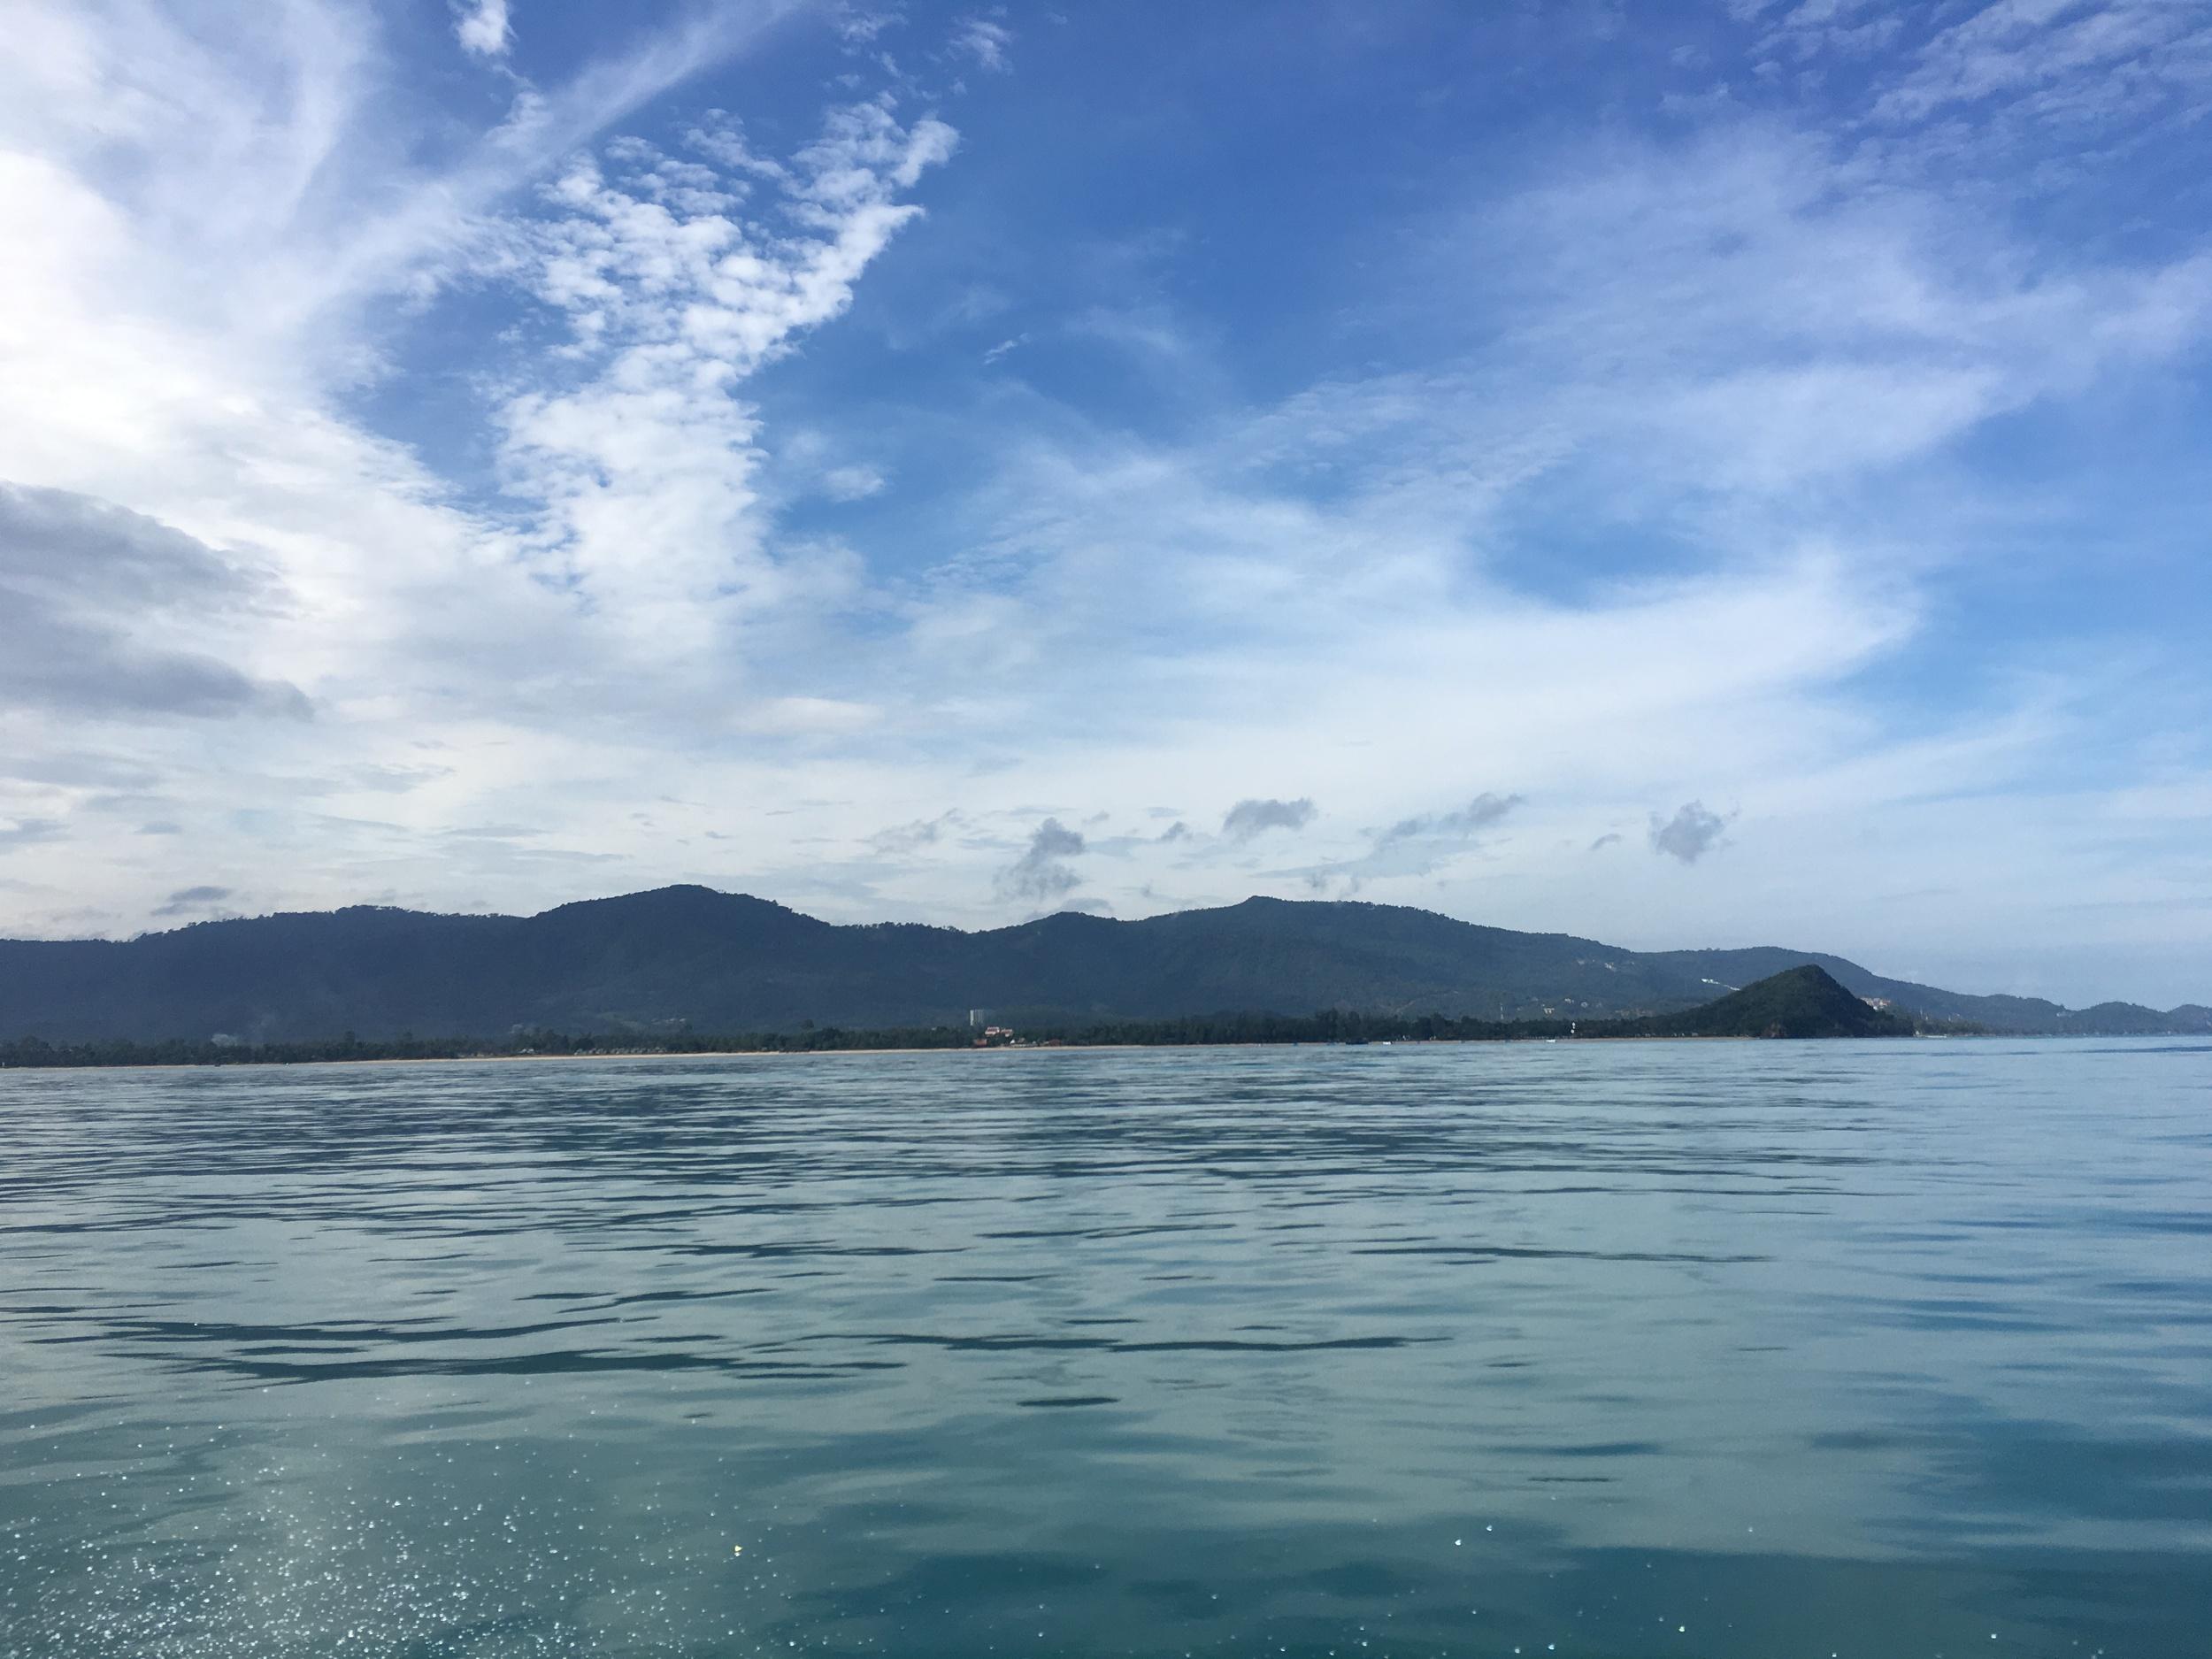 En route to An Thong Marine Park